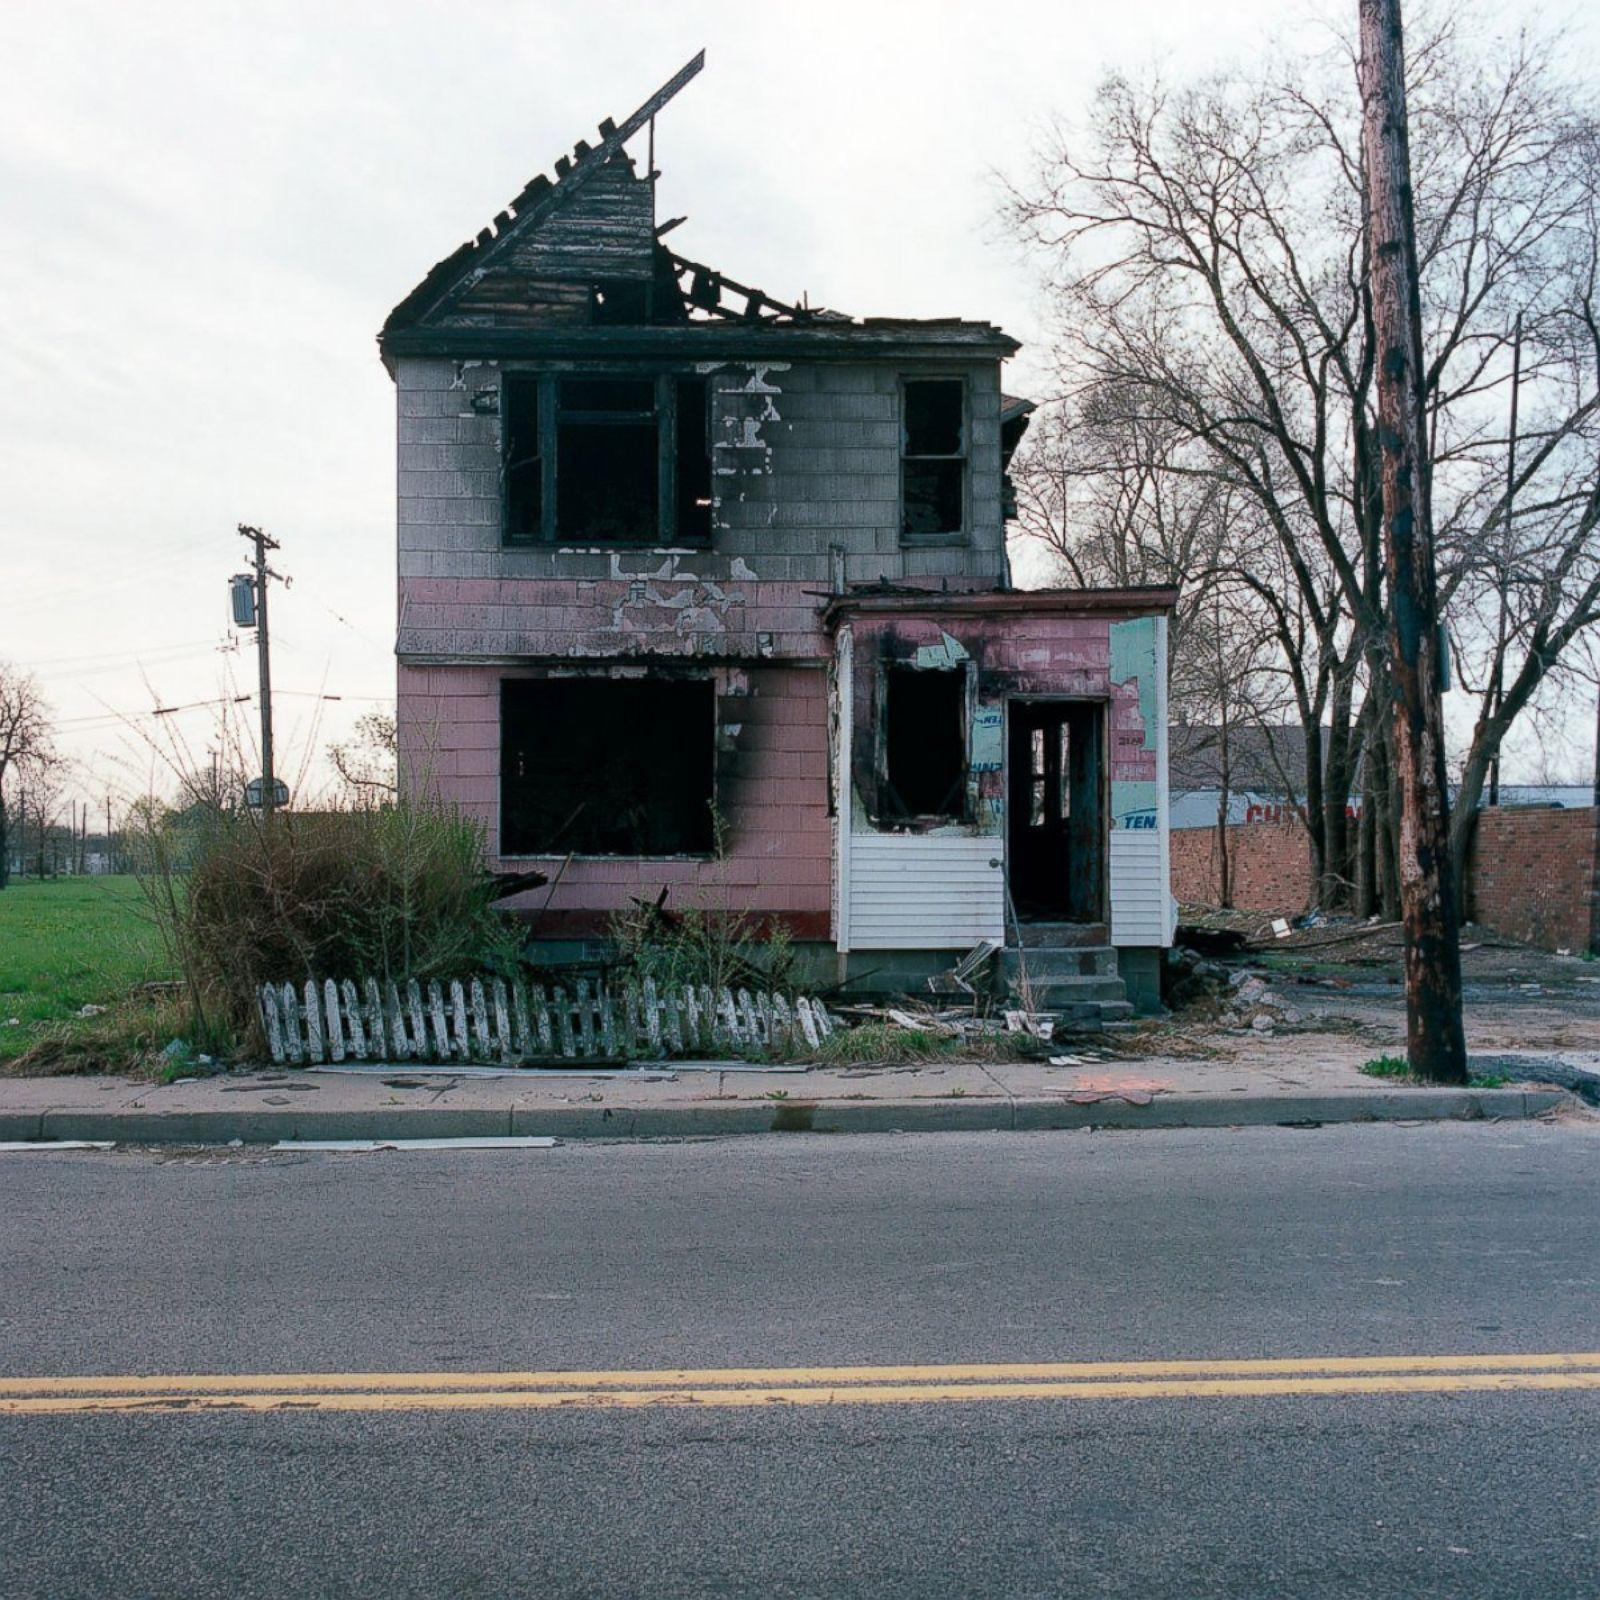 Crumbling Houses Show The Sad Decline Of Detroit Photos Abc News